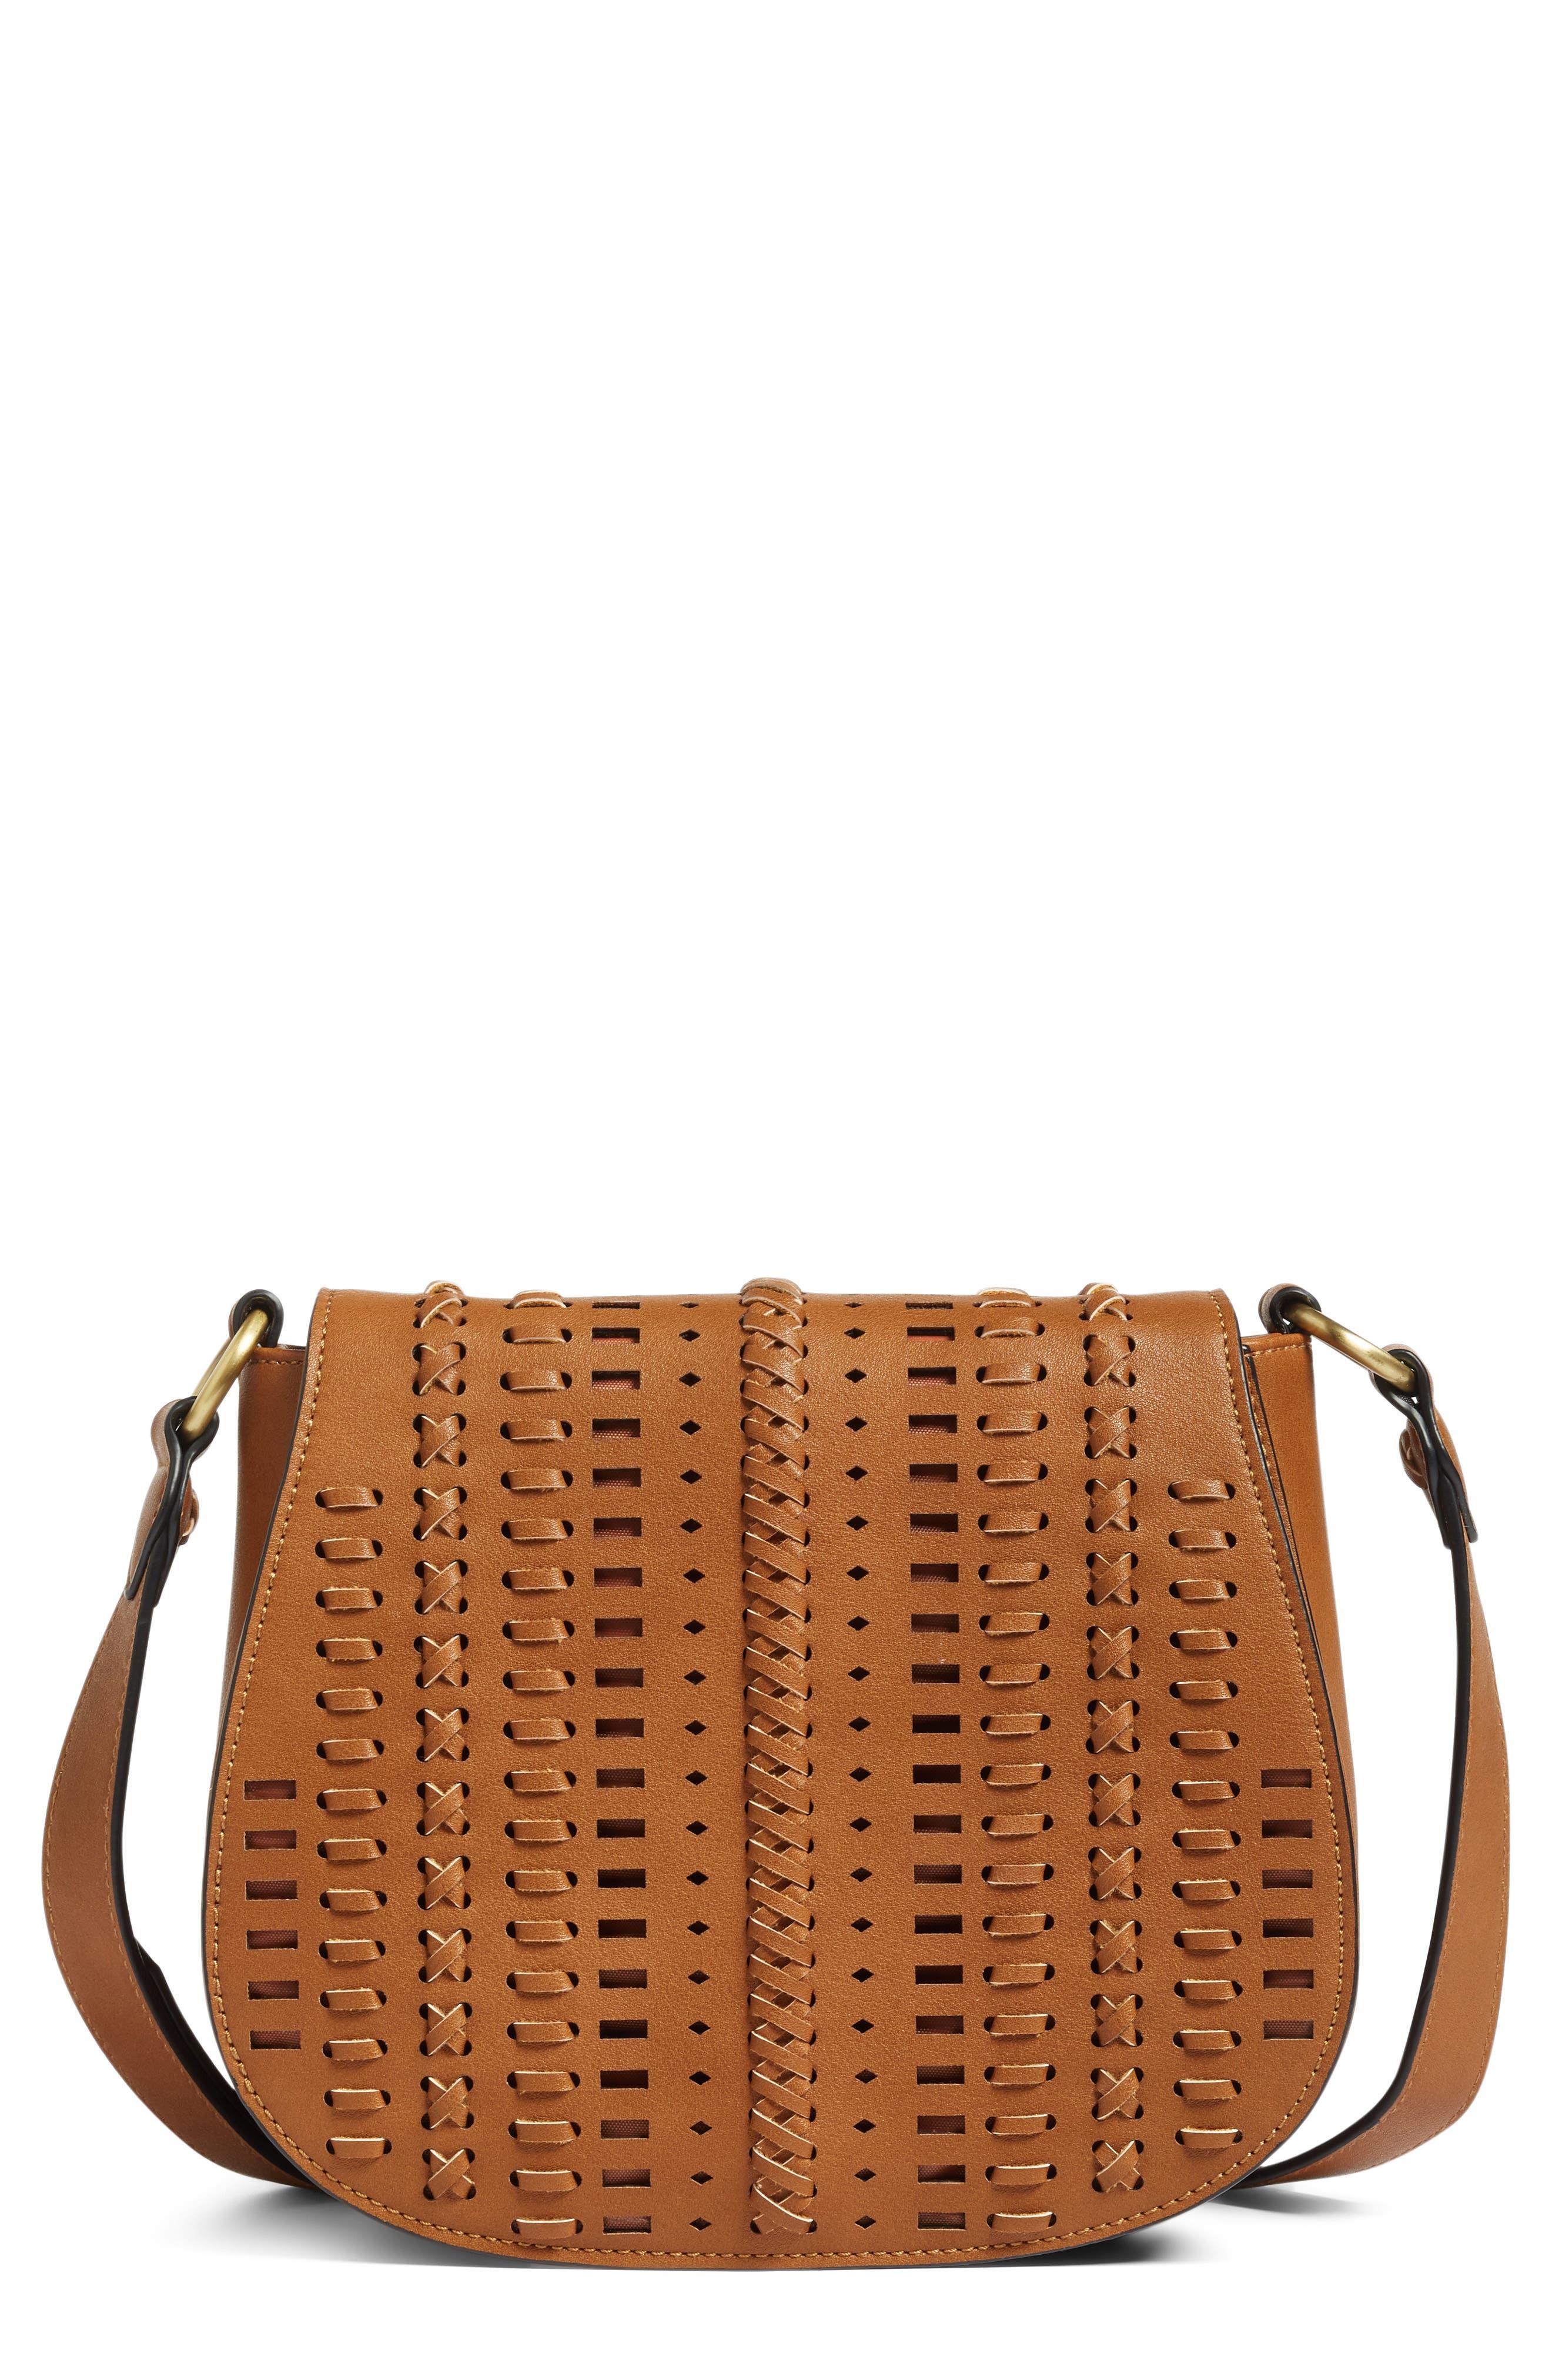 Phase 3 Woven Saddle Bag